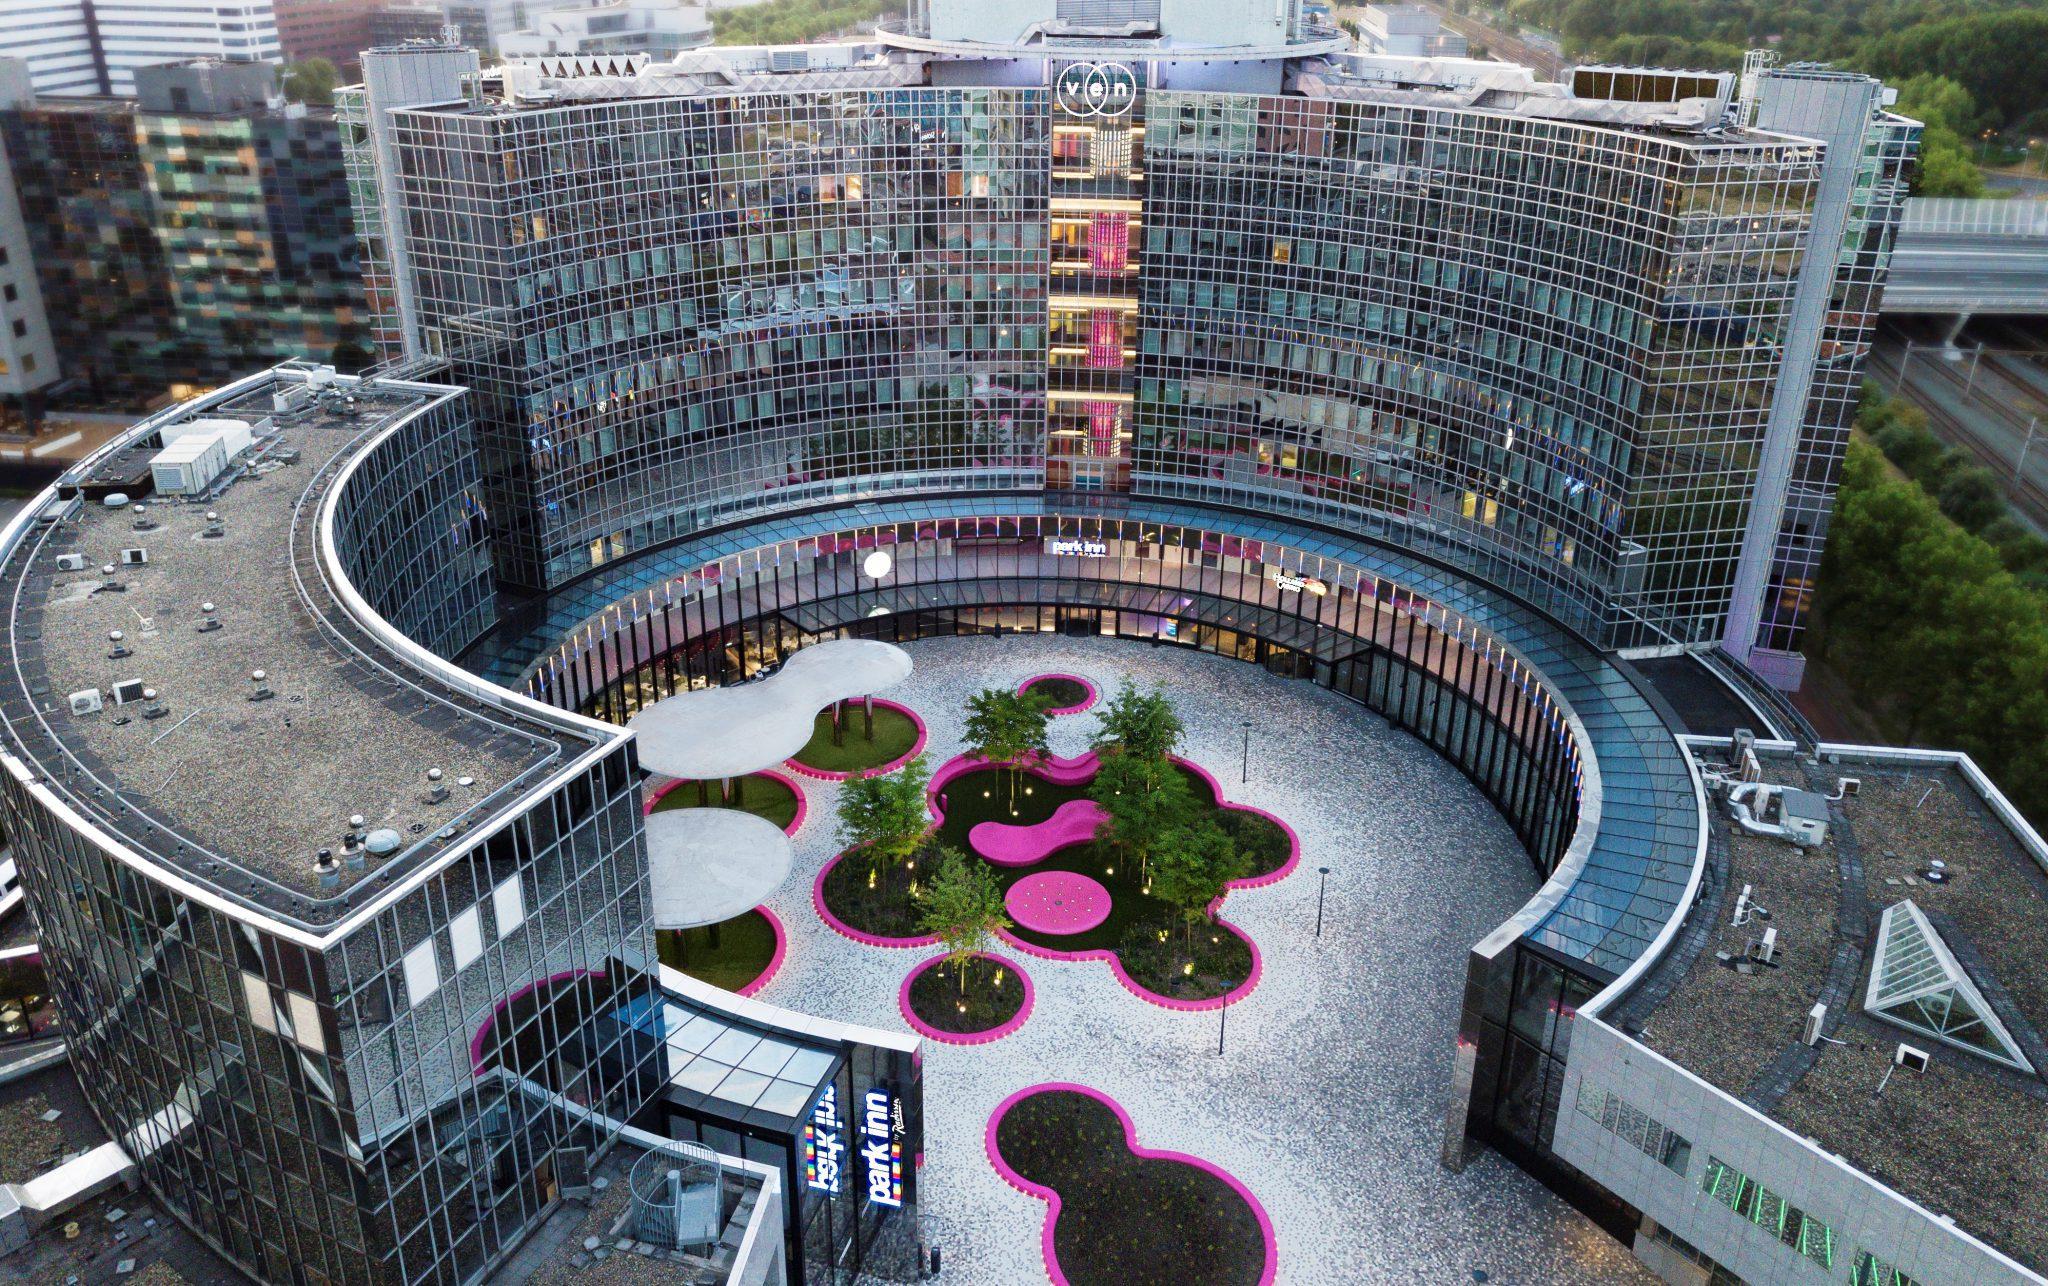 plein kleurrijk hotel VEN, siliconen